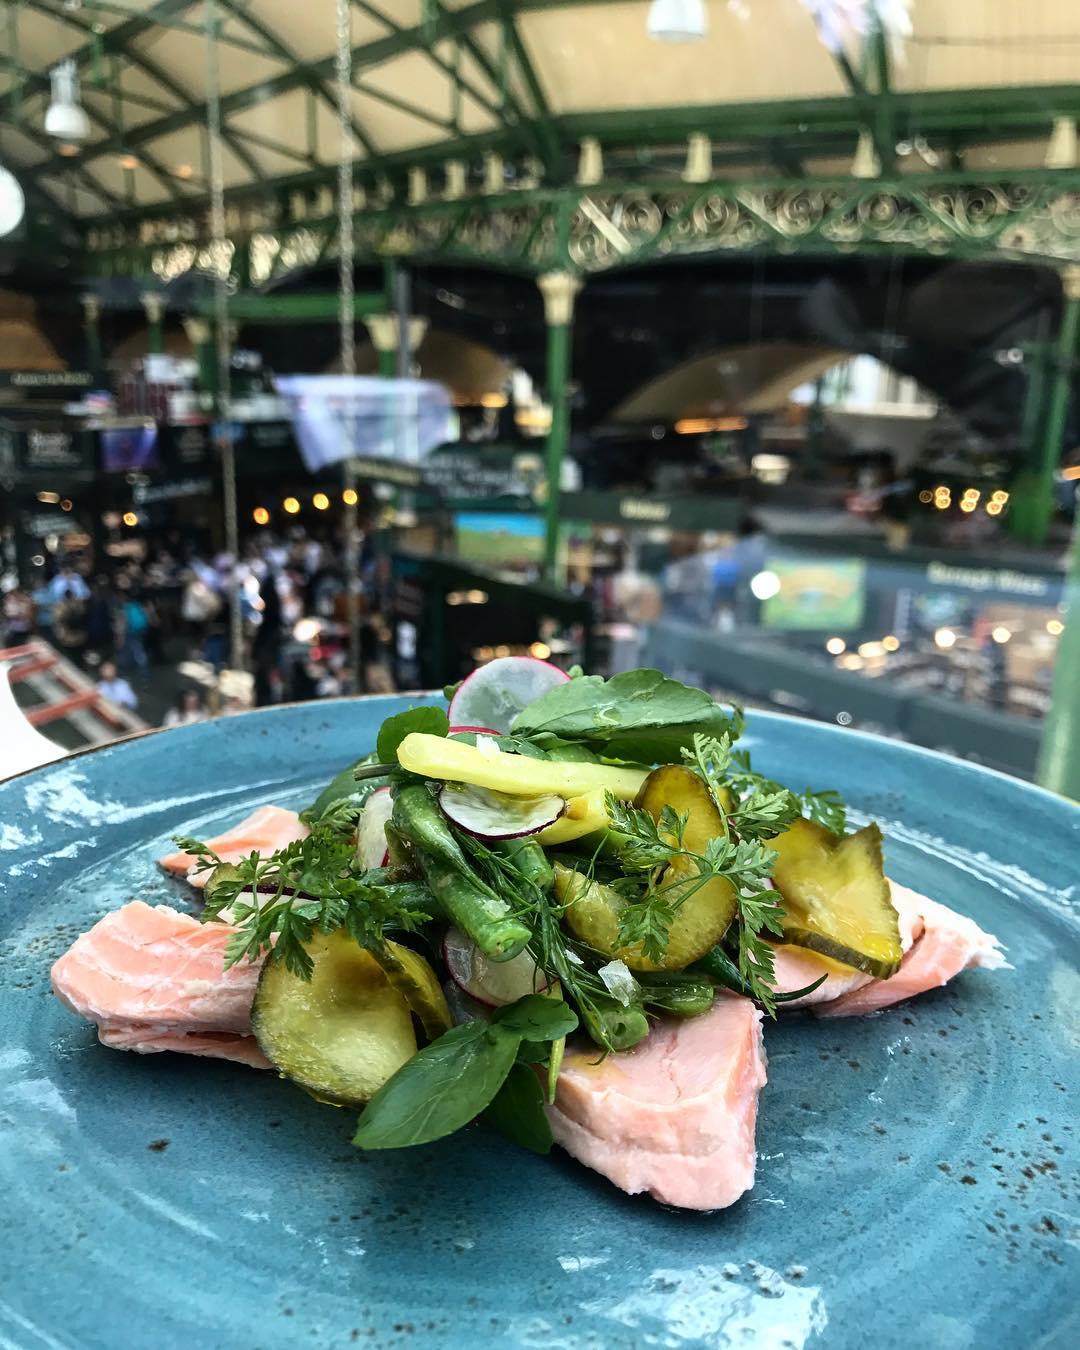 Restaurants near Tate Modern, Roast at Borough Market